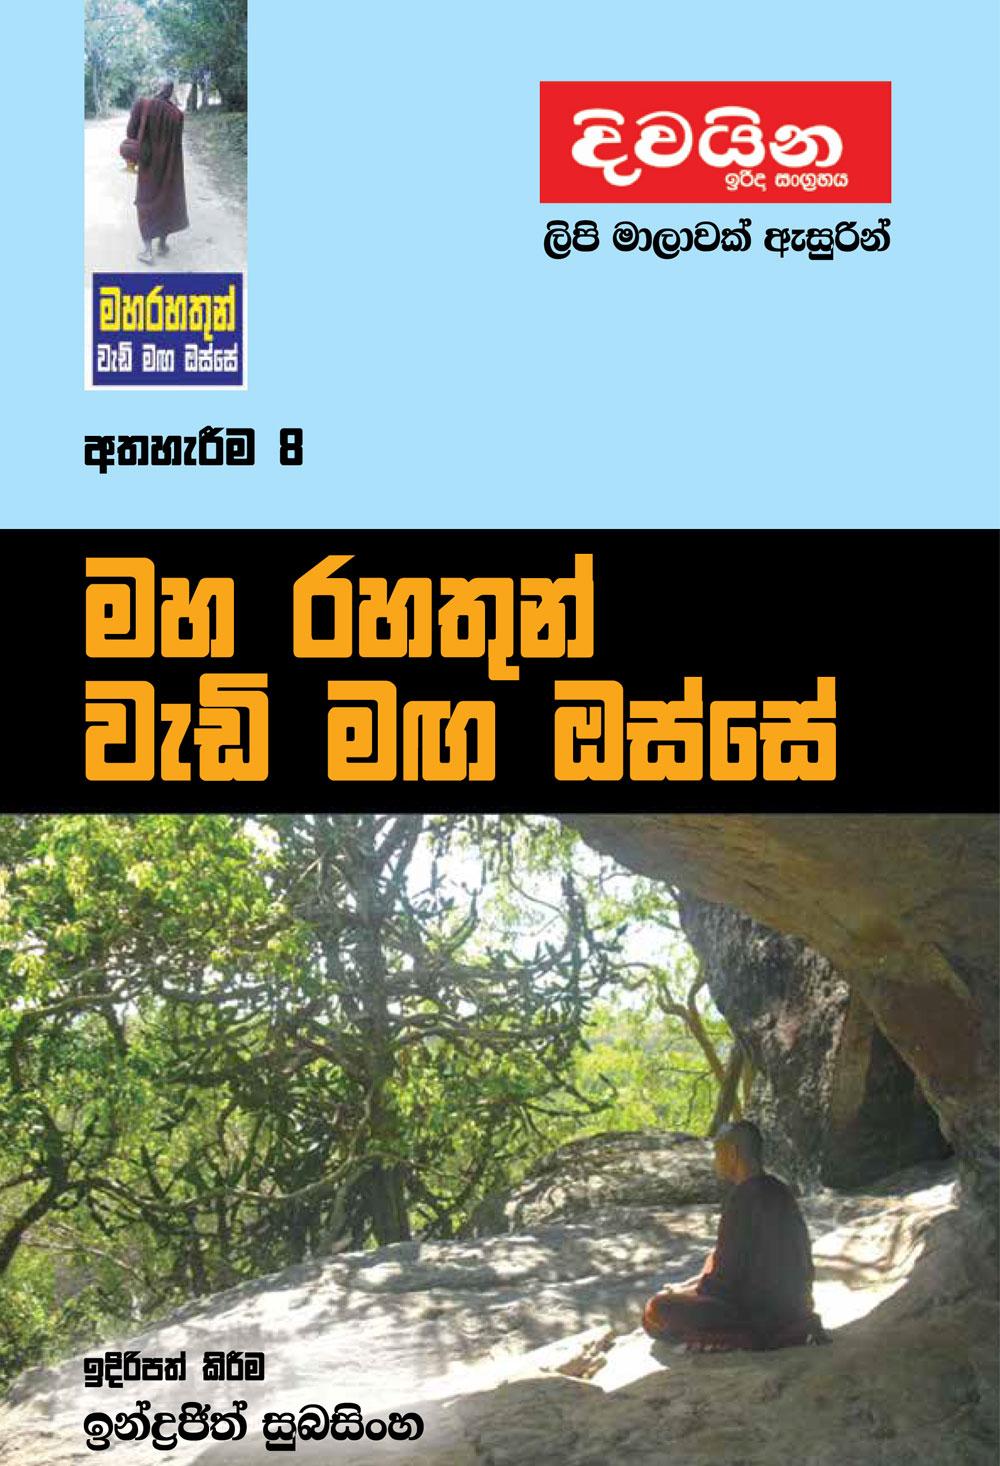 Maha Rahathun Wadi Maga Osse Book 8